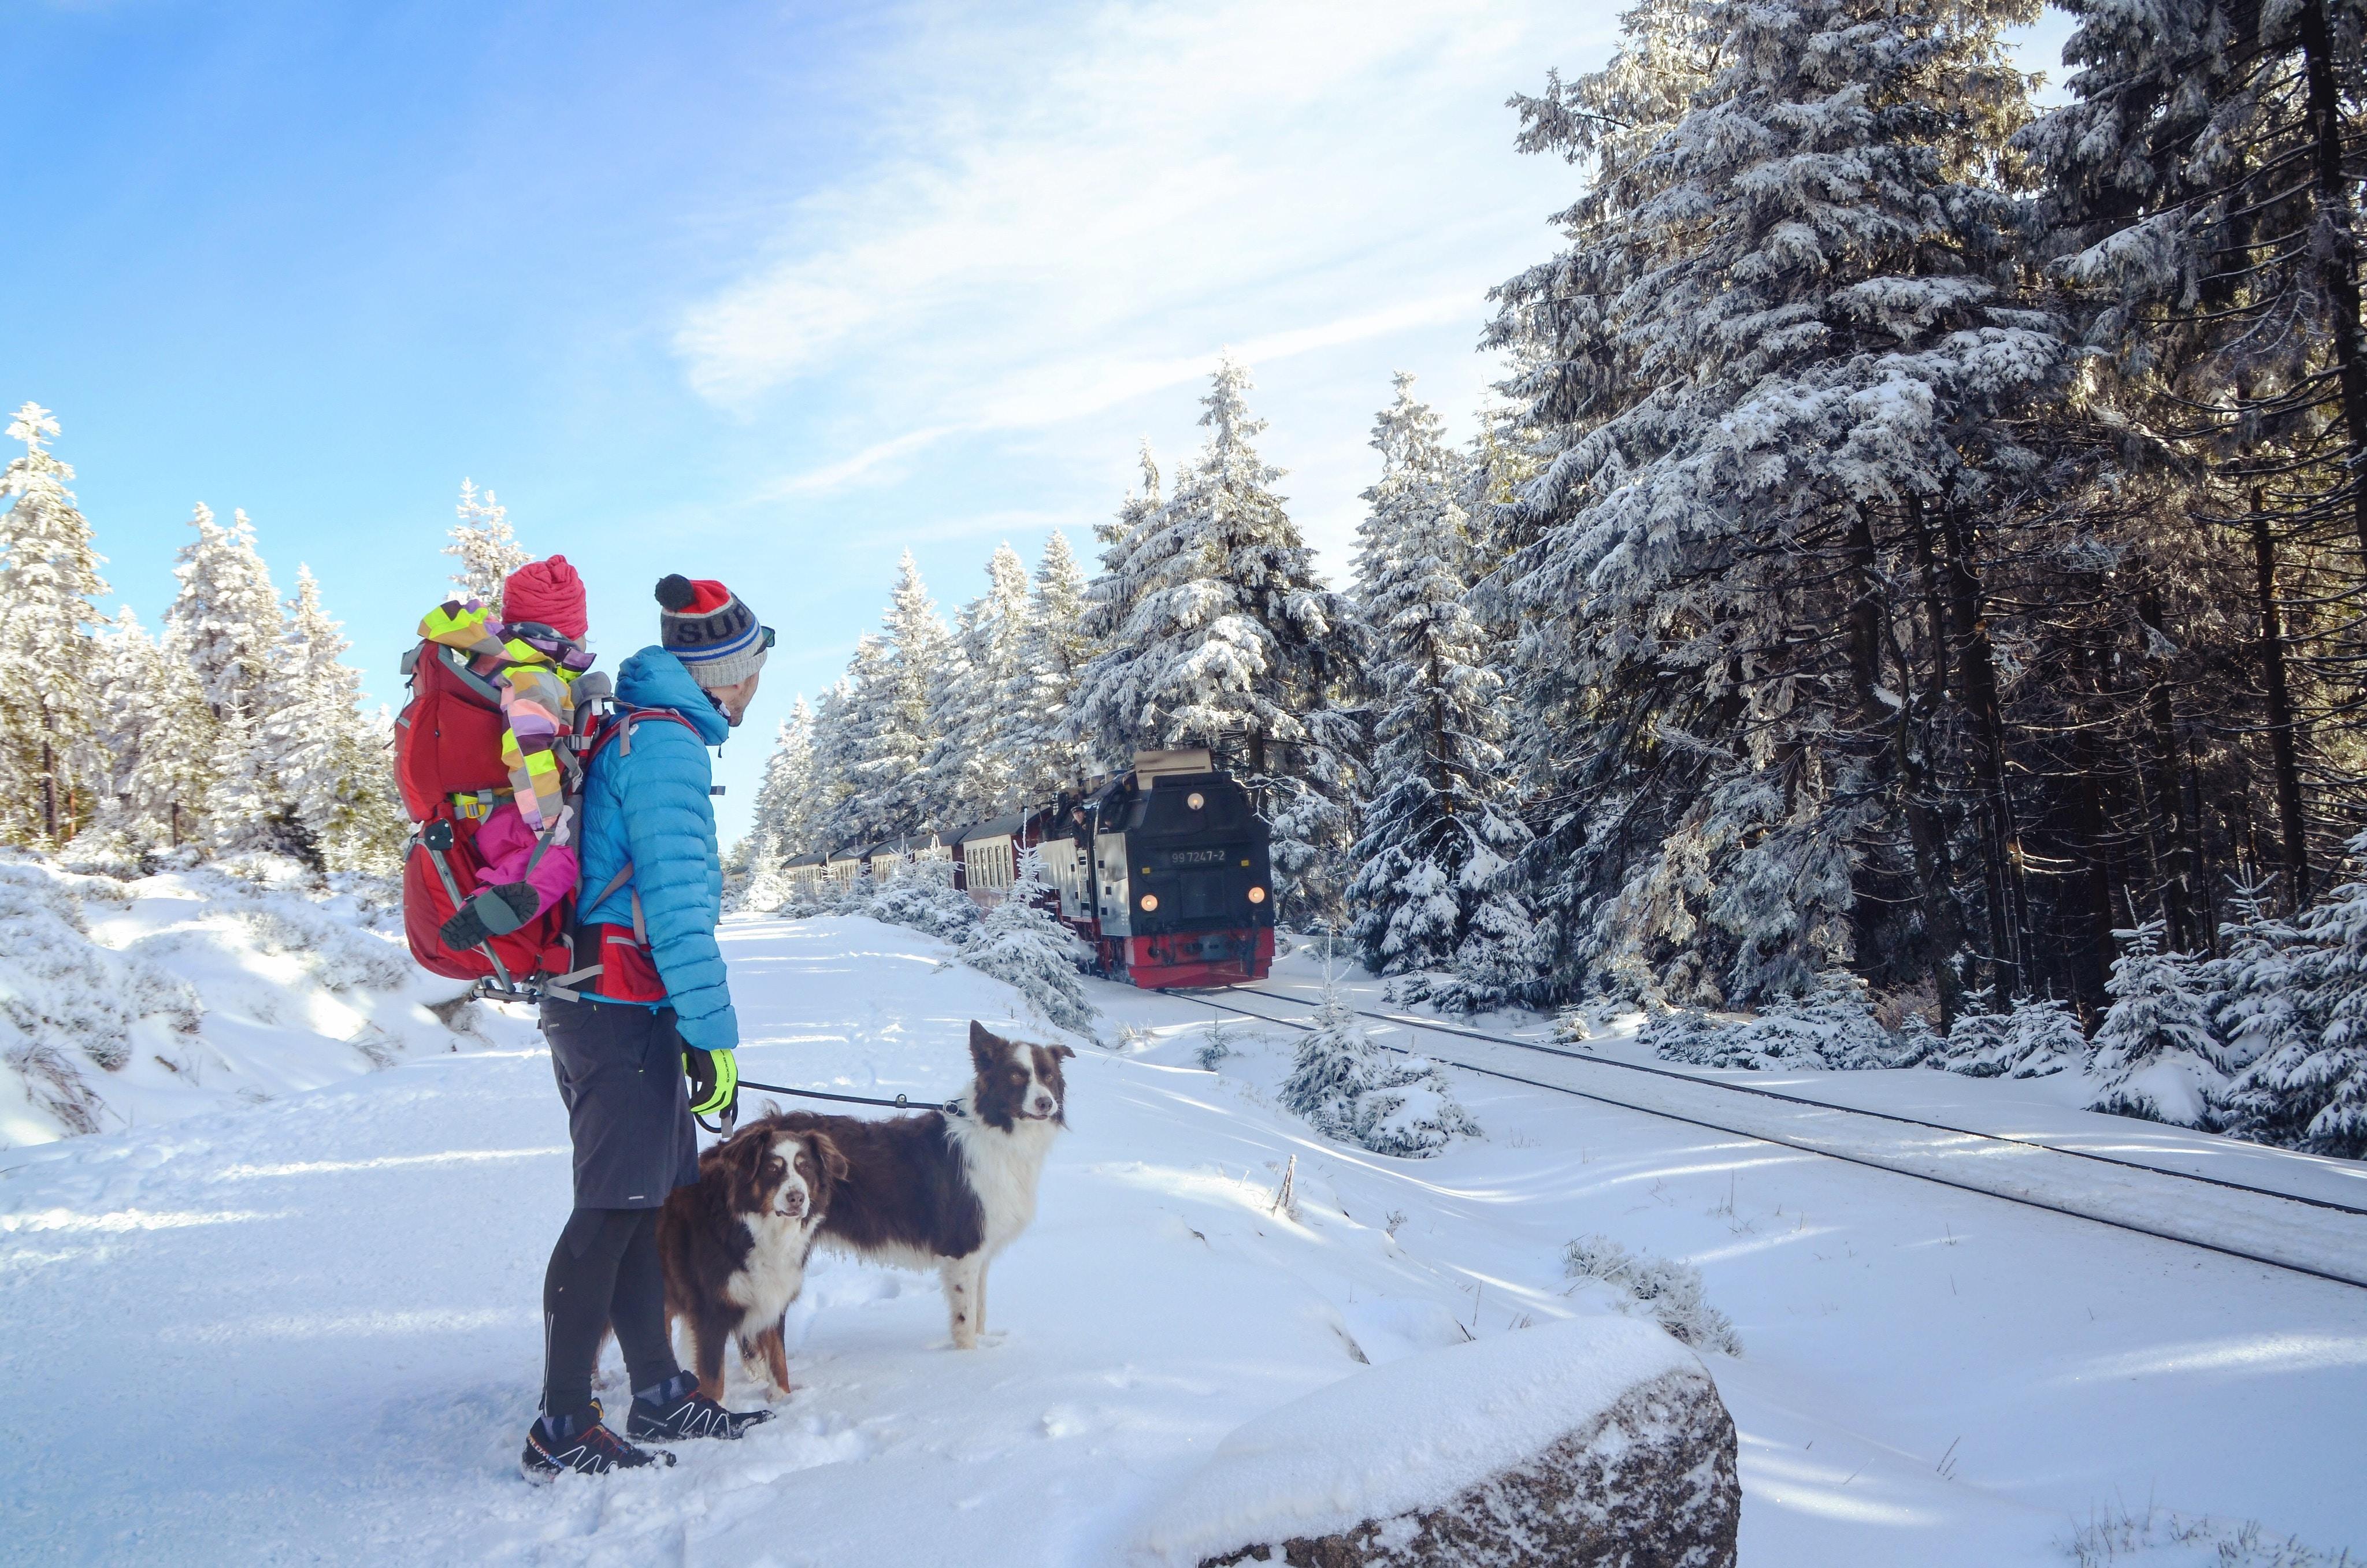 man and dog on snow terrain